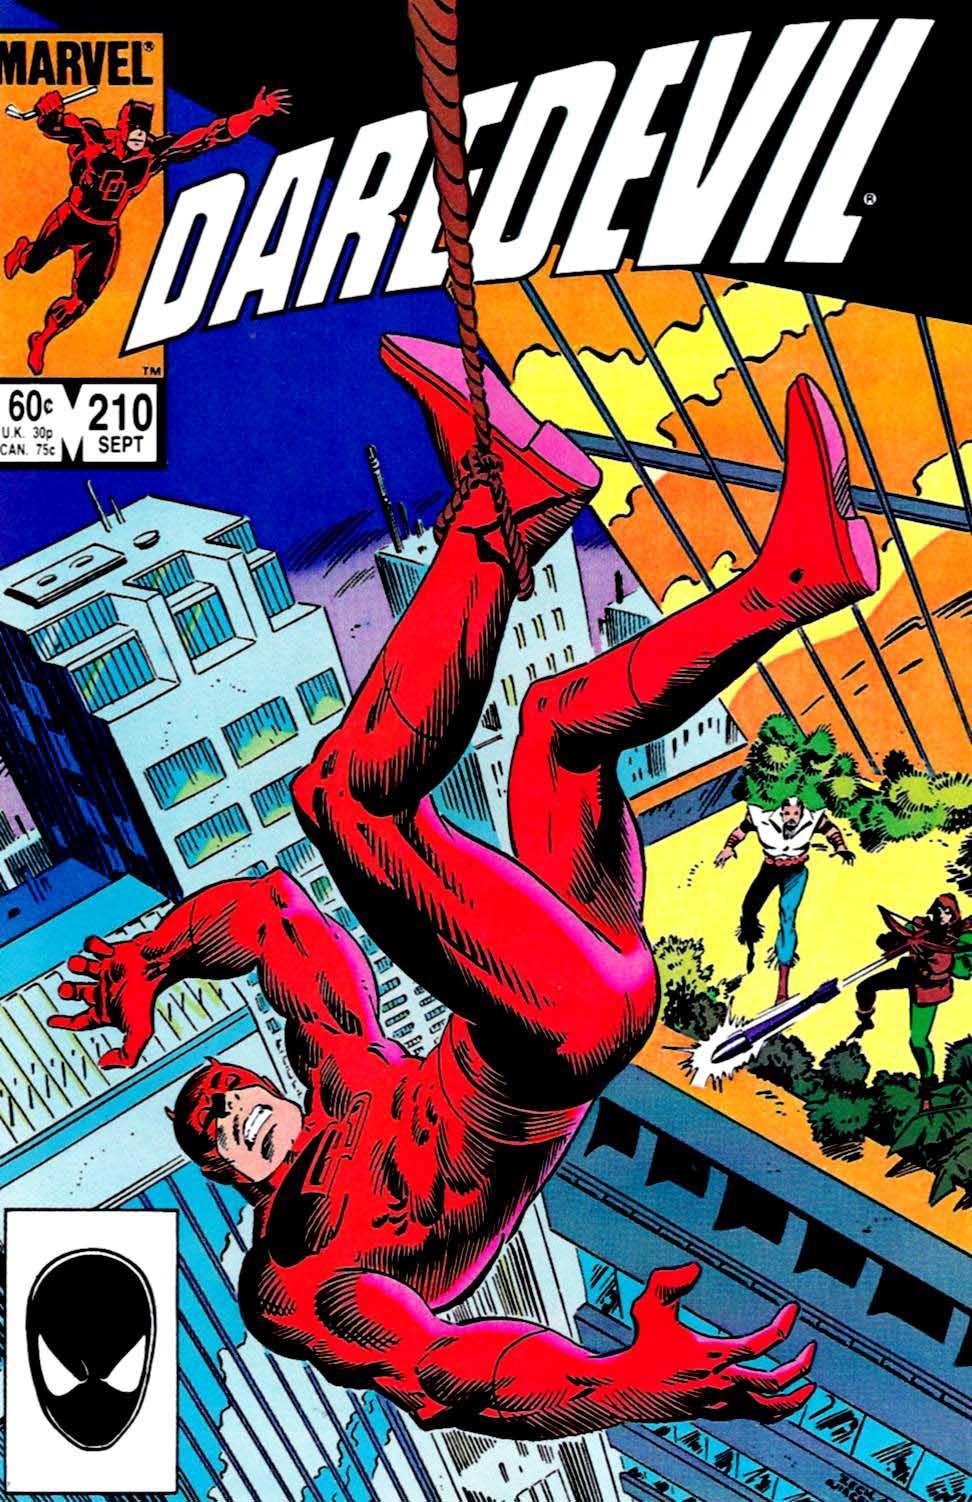 Daredevil (O'Neil/Mazzucchelli)